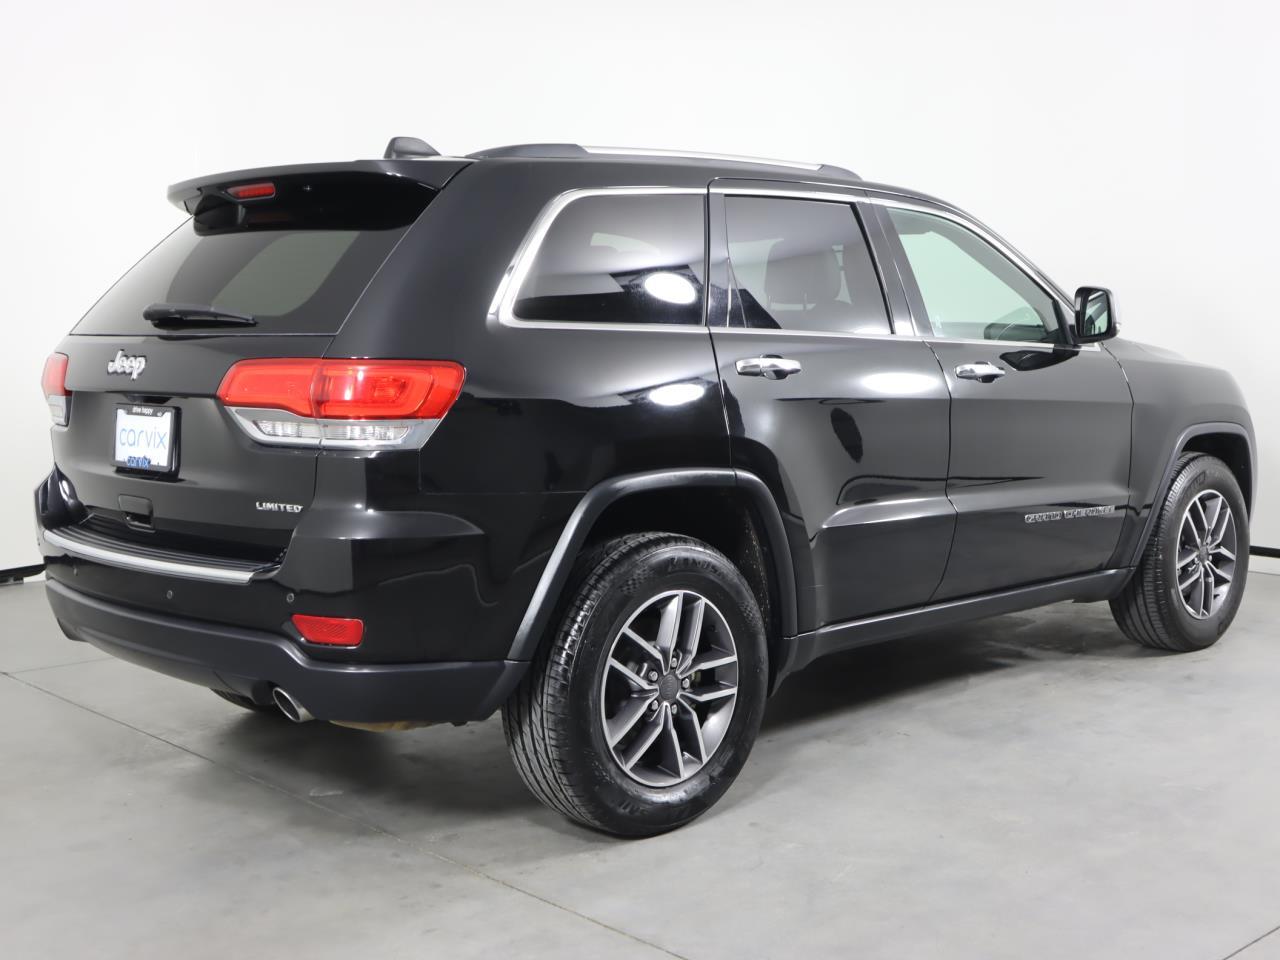 used vehicle - SUV JEEP GRAND CHEROKEE 2019